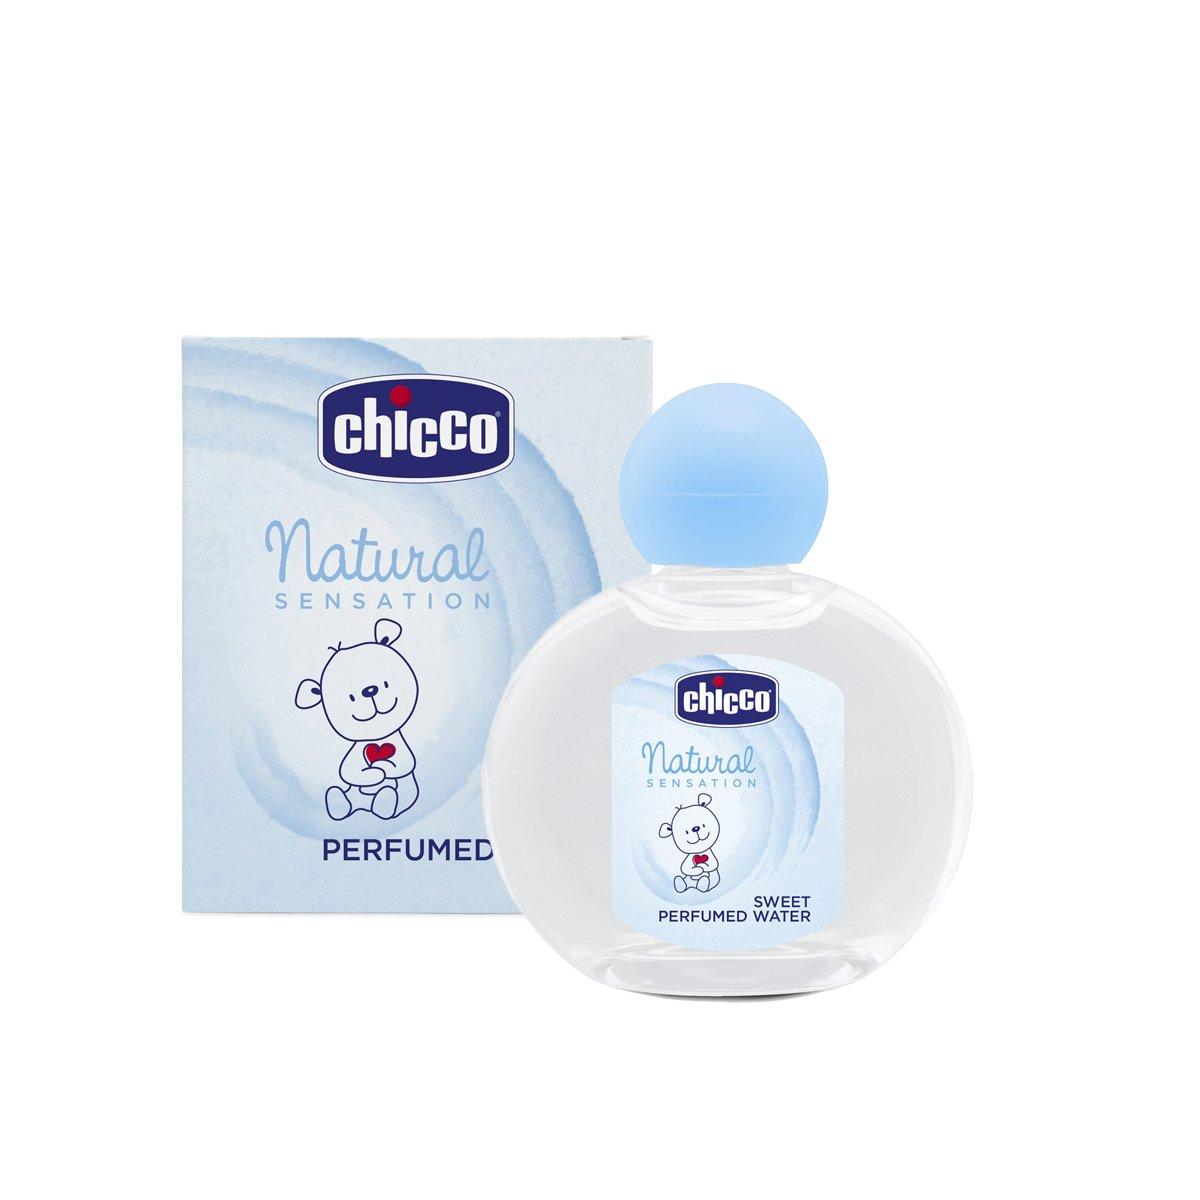 Chicco Natural Sensation - Agua perfumada sin alcohol, 100 ml